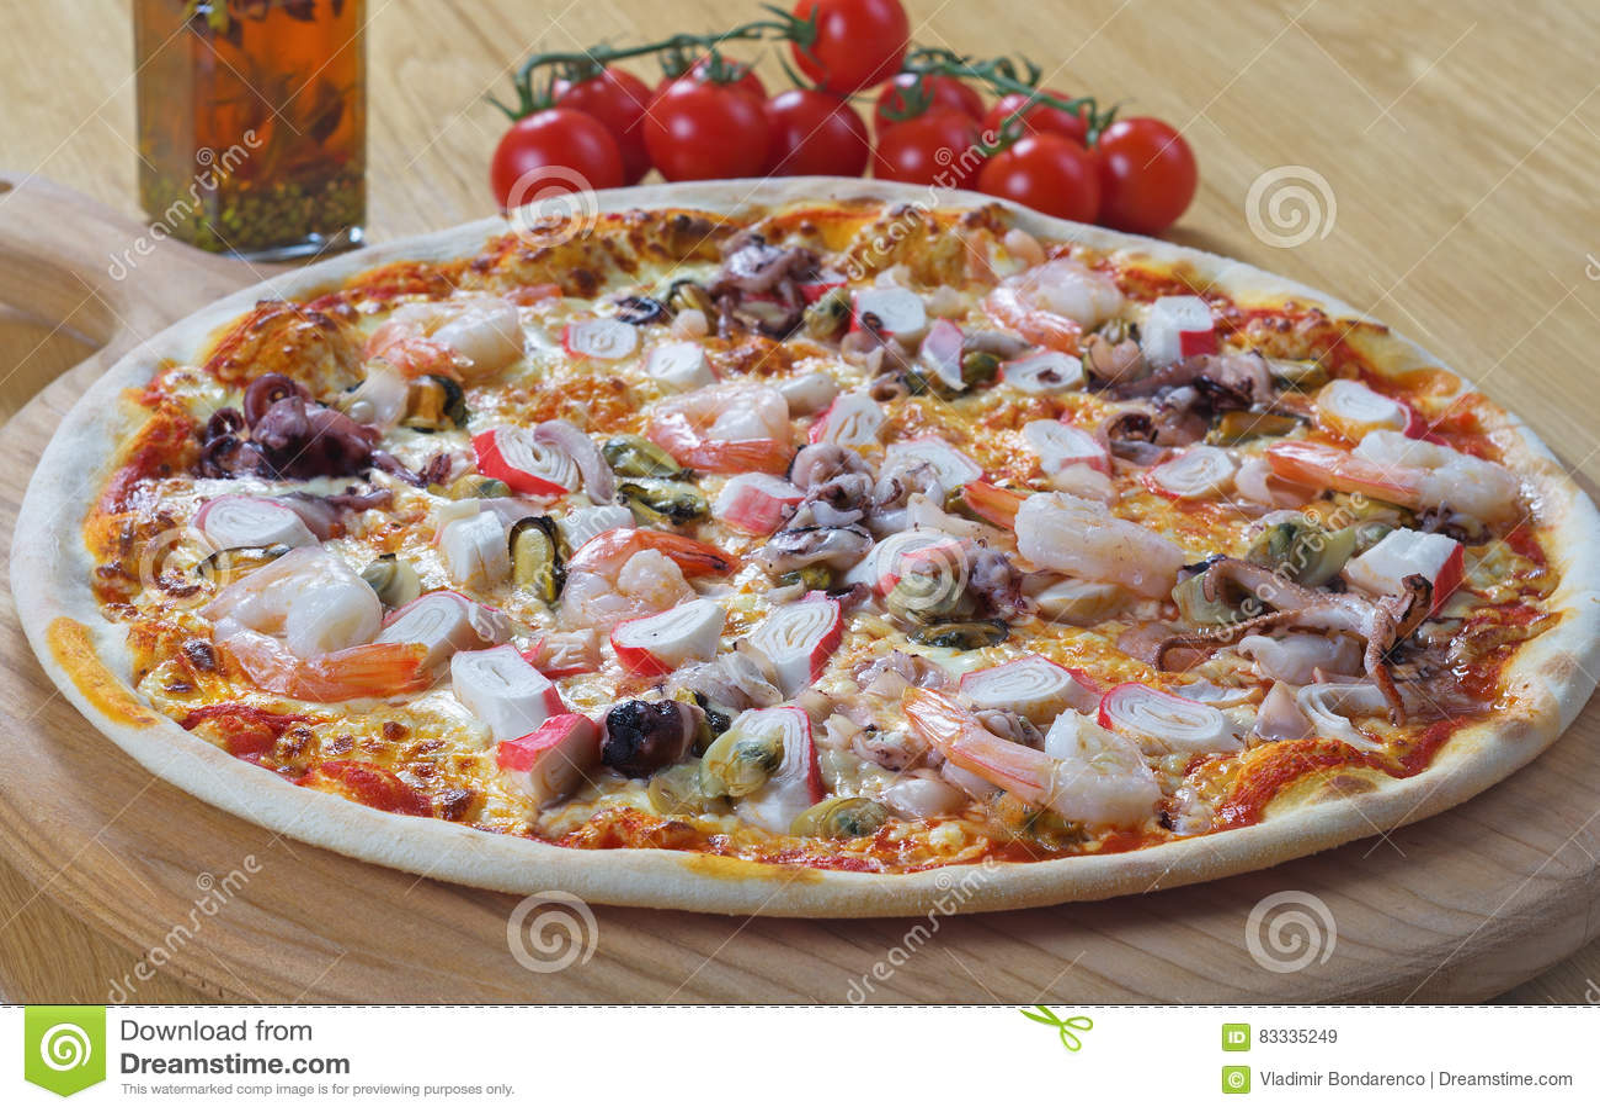 Original italian seafood pizza stock photography for Pizza original